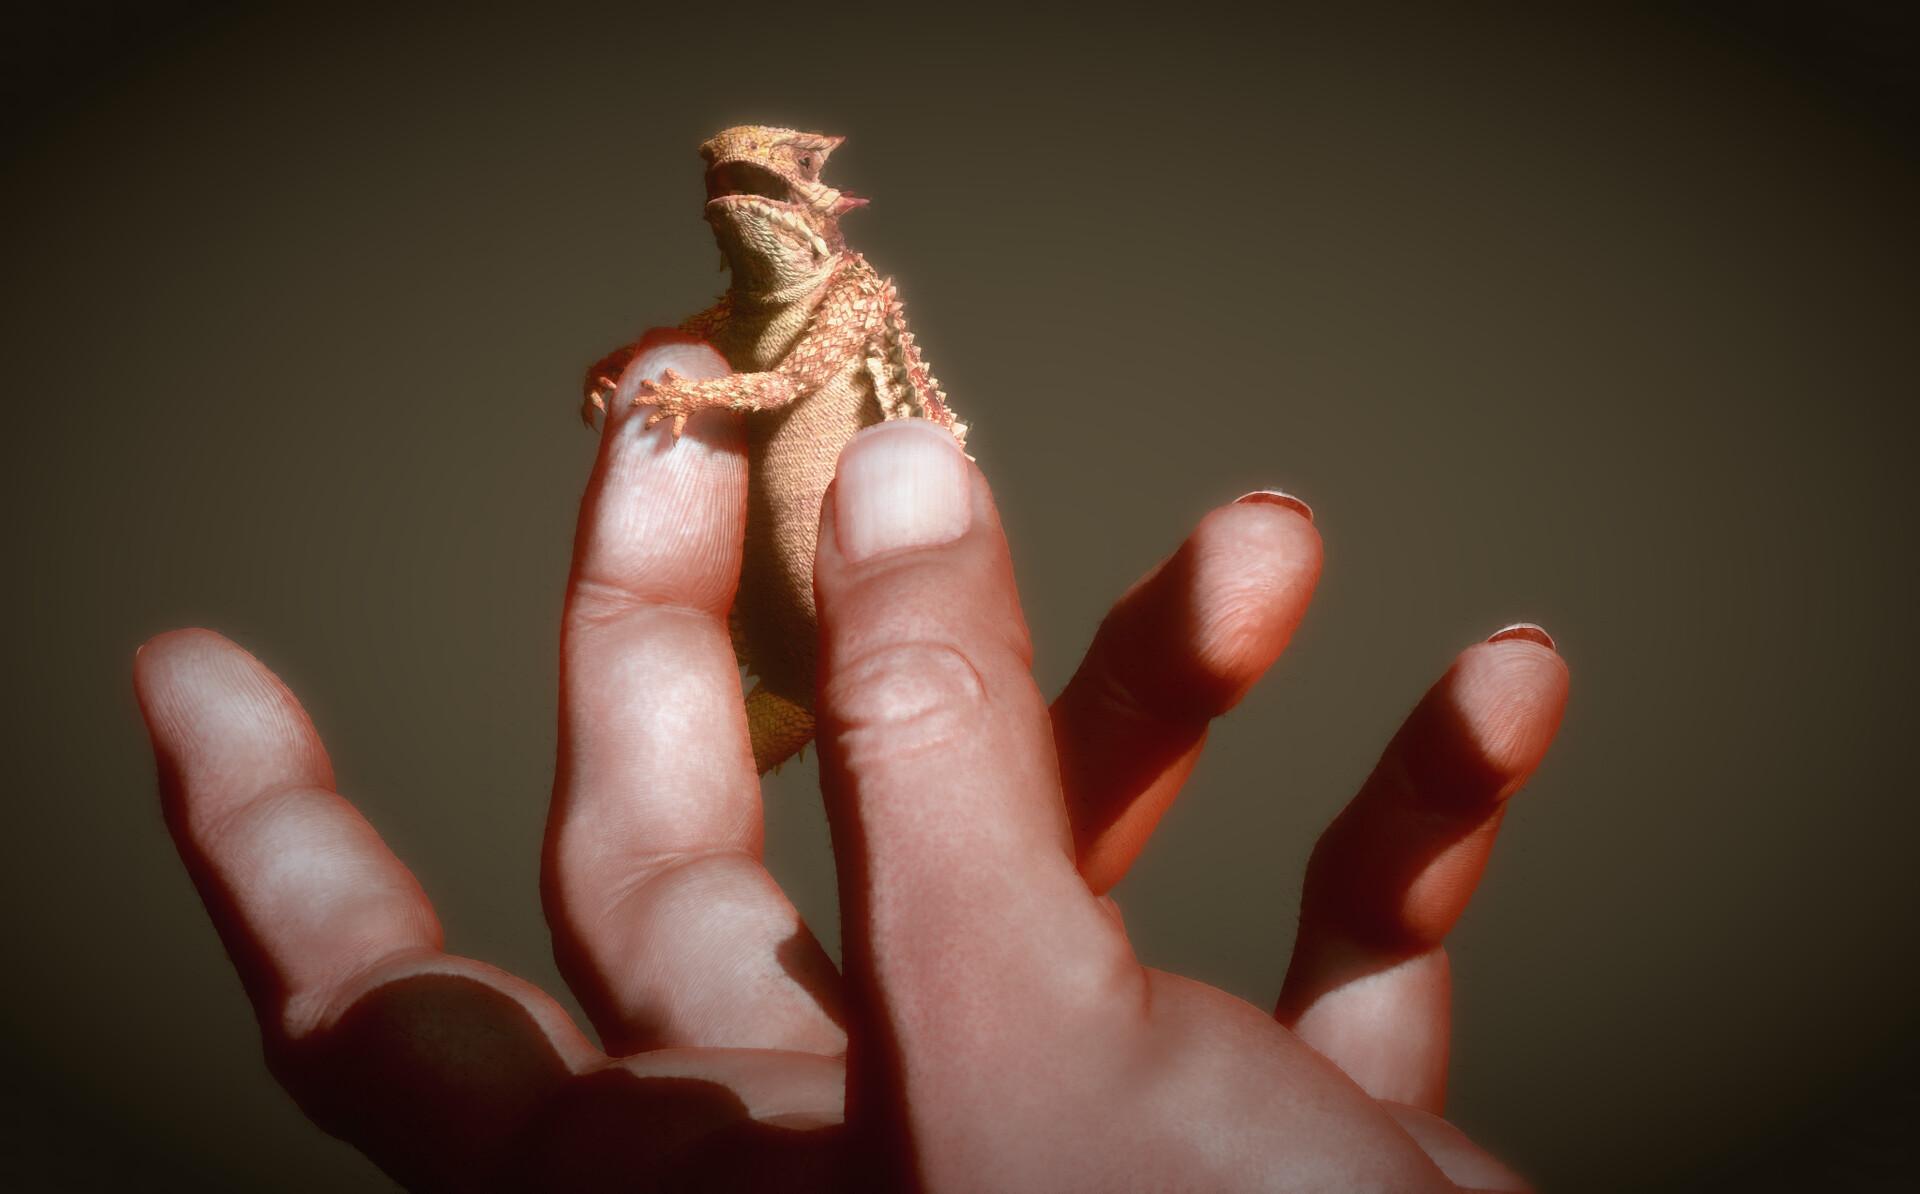 Eric keller keller lizard 003